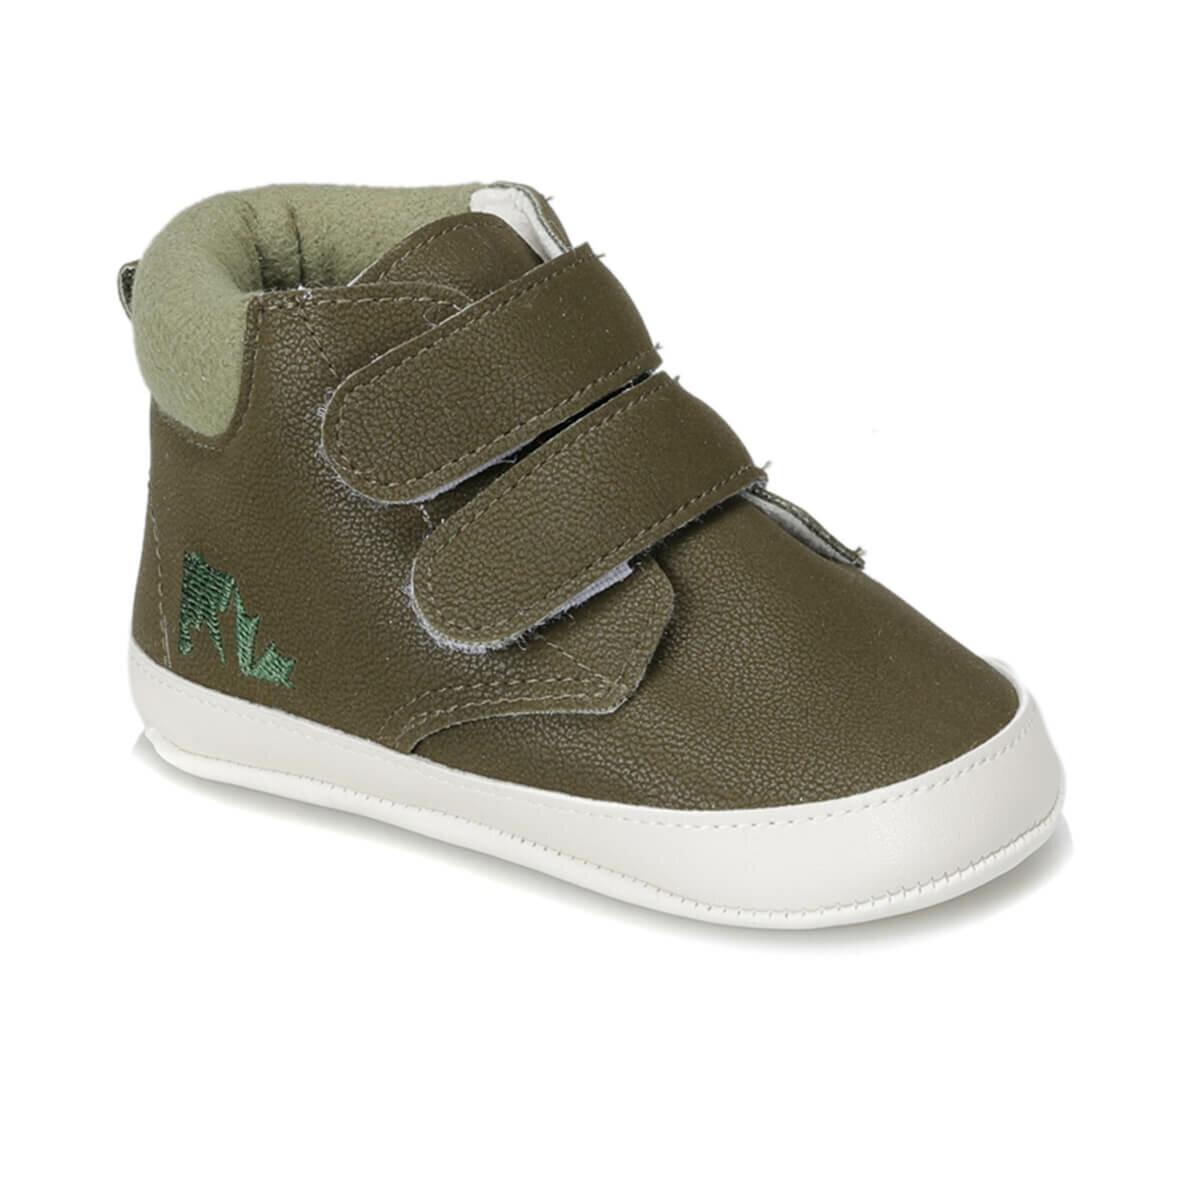 FLO BATTY 9PR Khaki Male Child Hiking Shoes LUMBERJACK